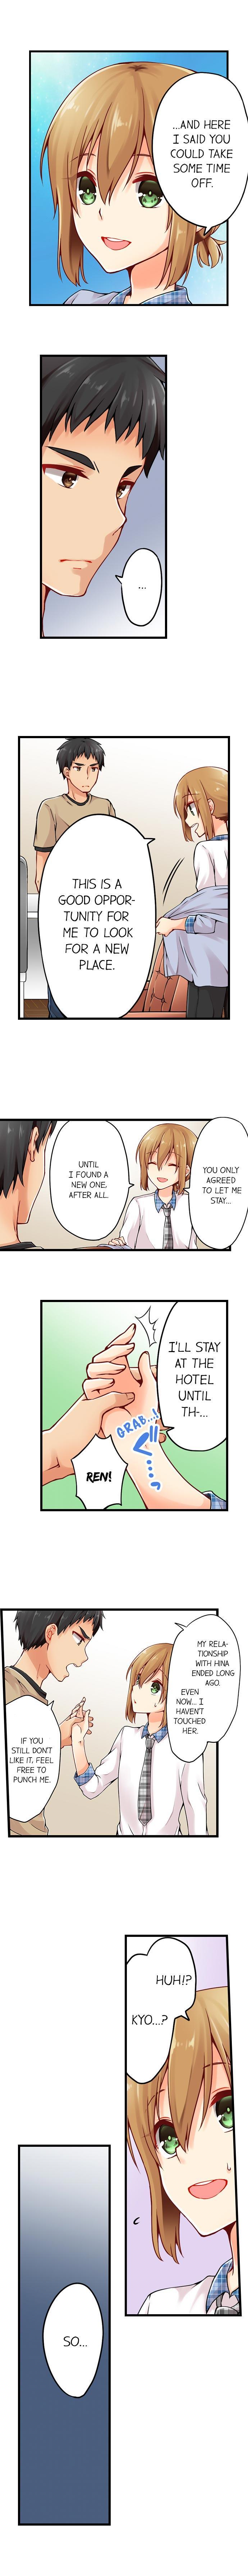 Ren Arisugawa Is Actually A Girl 390